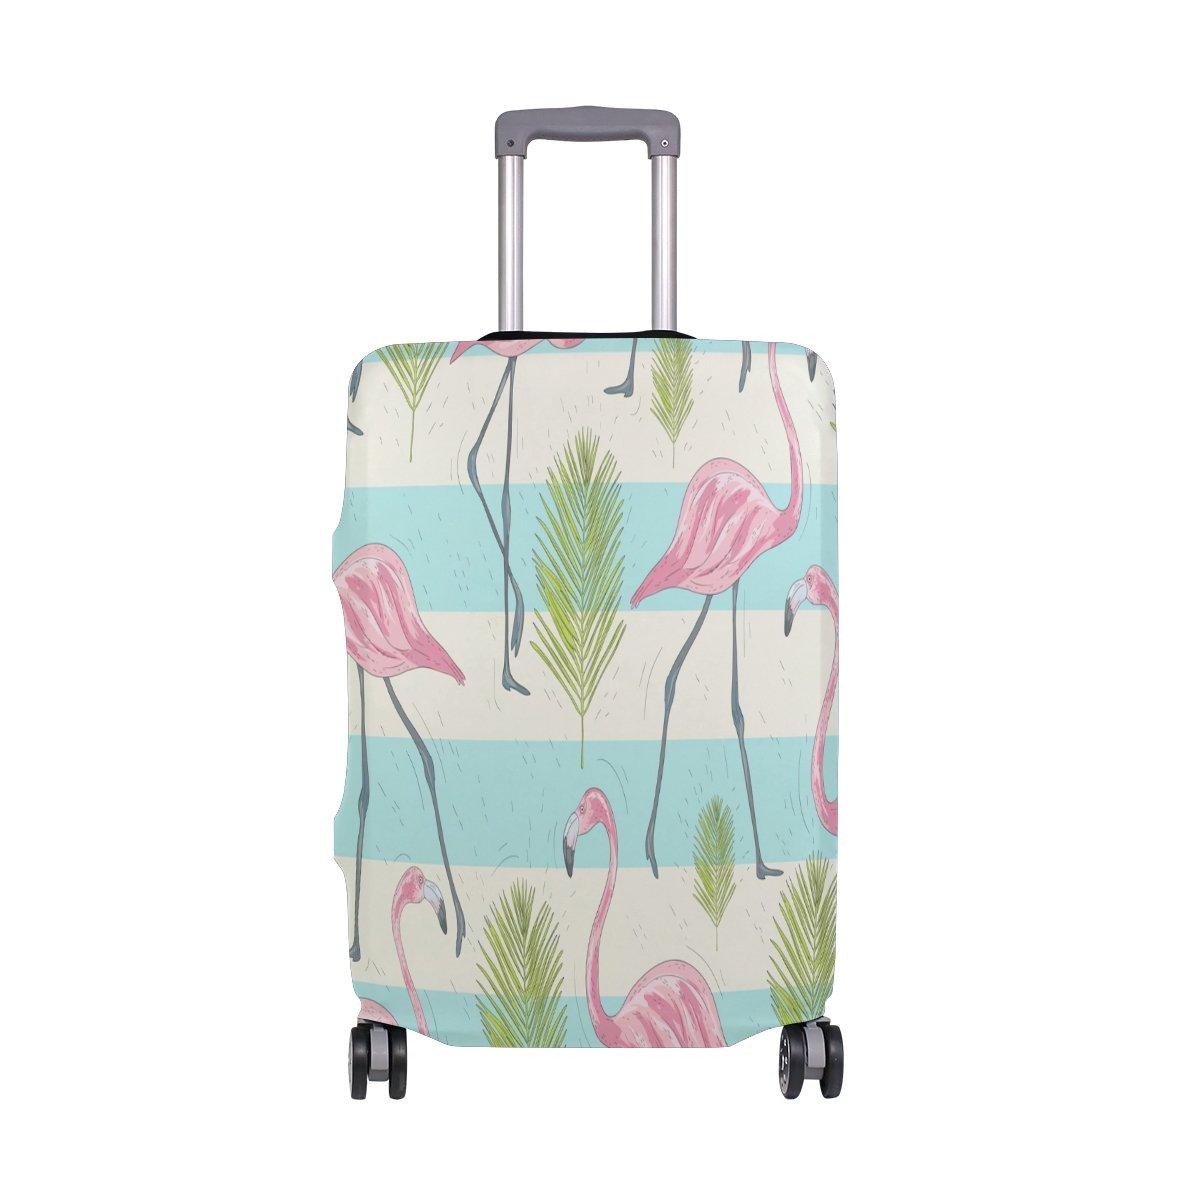 suabo旅行荷物カバーFits 18 – 20インチスーツケースwithフラミンゴとヤシプリントスーツケースカバー L 26-28 in  B07FS9KGDM